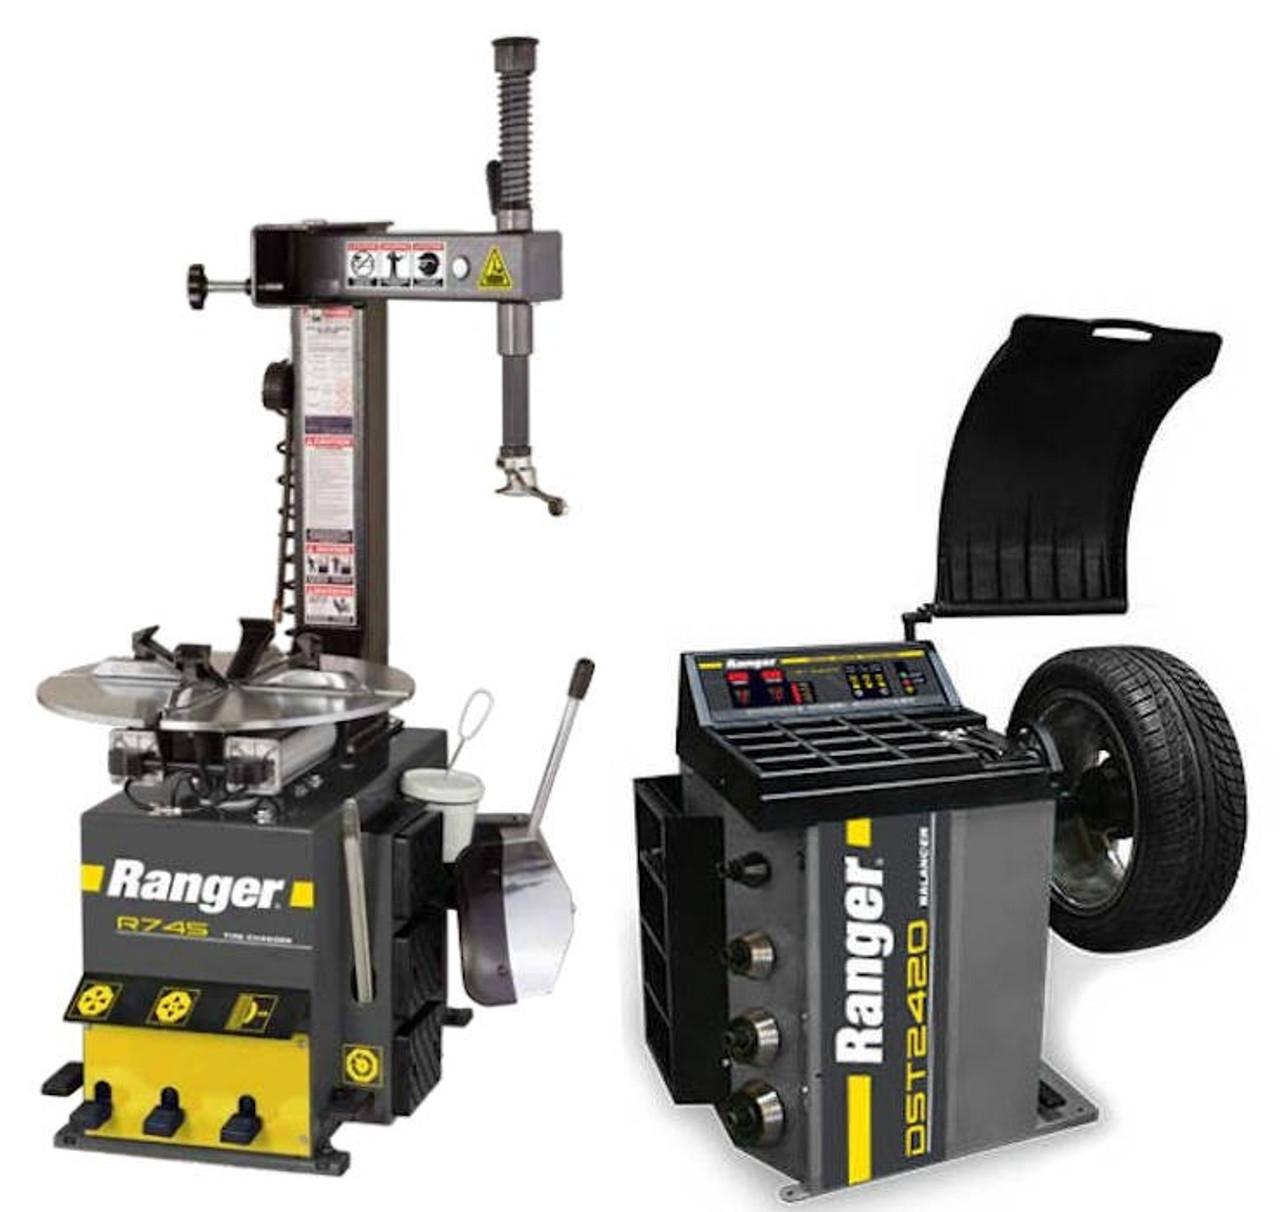 Ranger DST2420 Wheel Balancer and R745 Tire Changer Combo